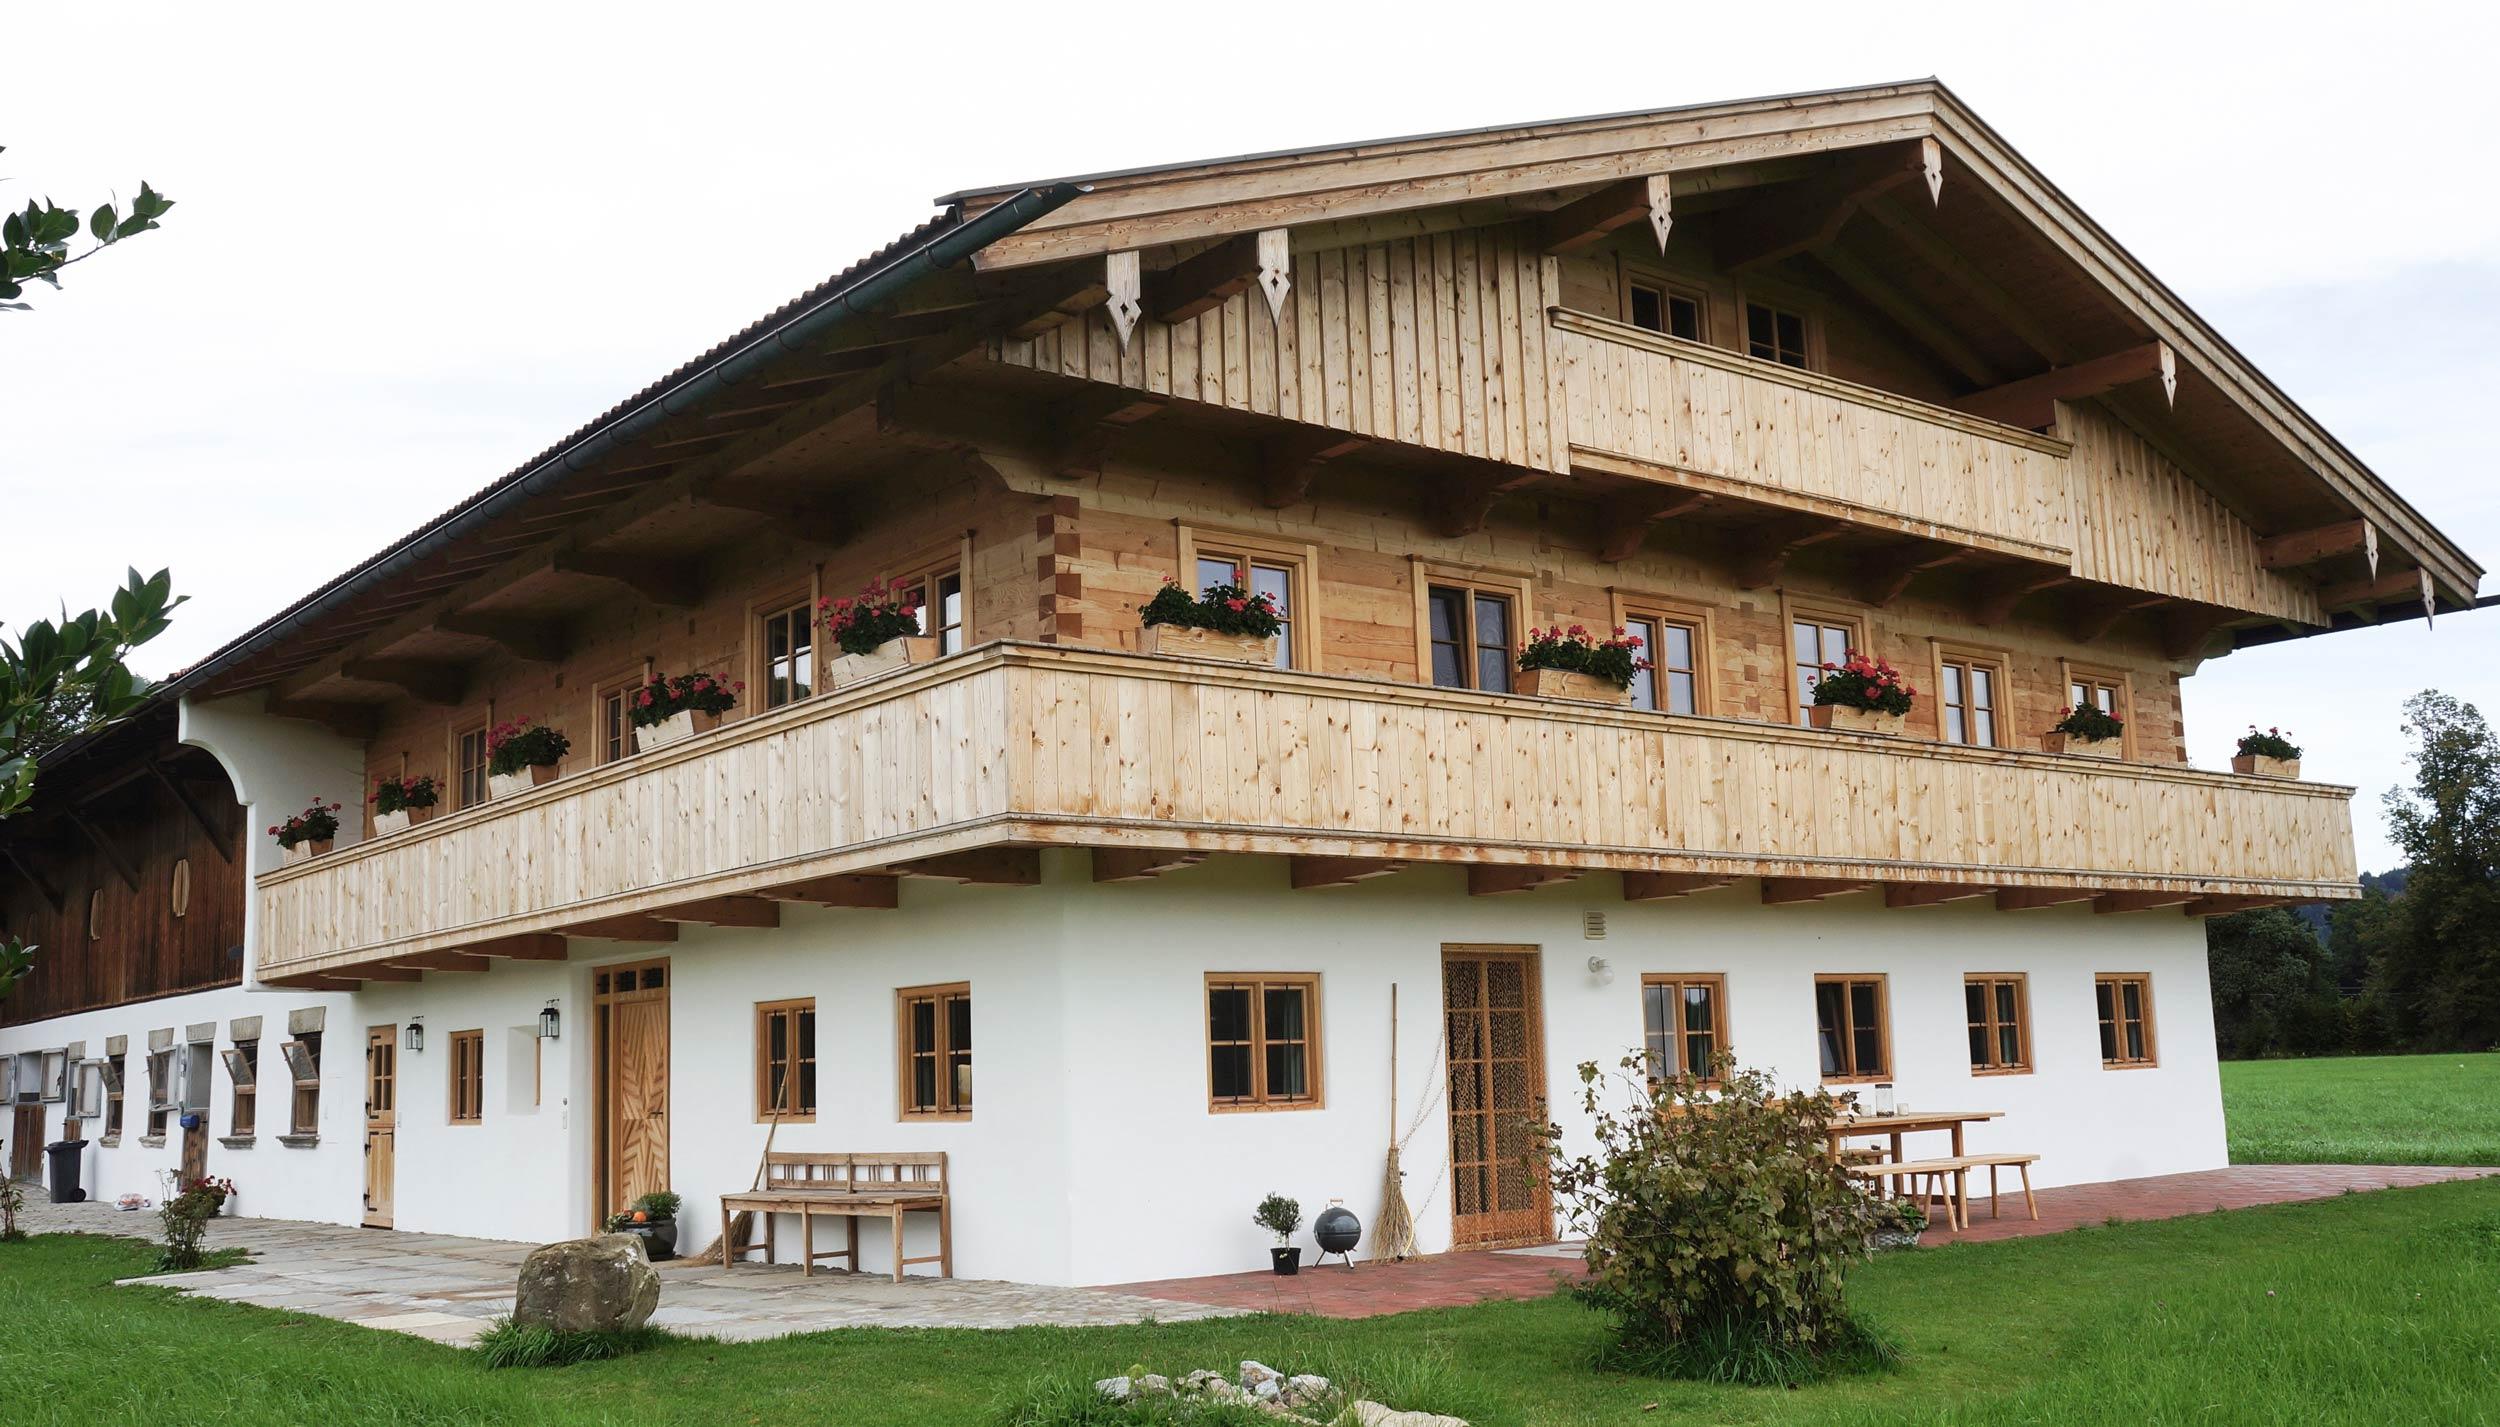 zimmerei-stoib-holzbau-holzhaus-bauernhof-sanierung-umbau-blockhaus-balkon-warngau-01.jpg